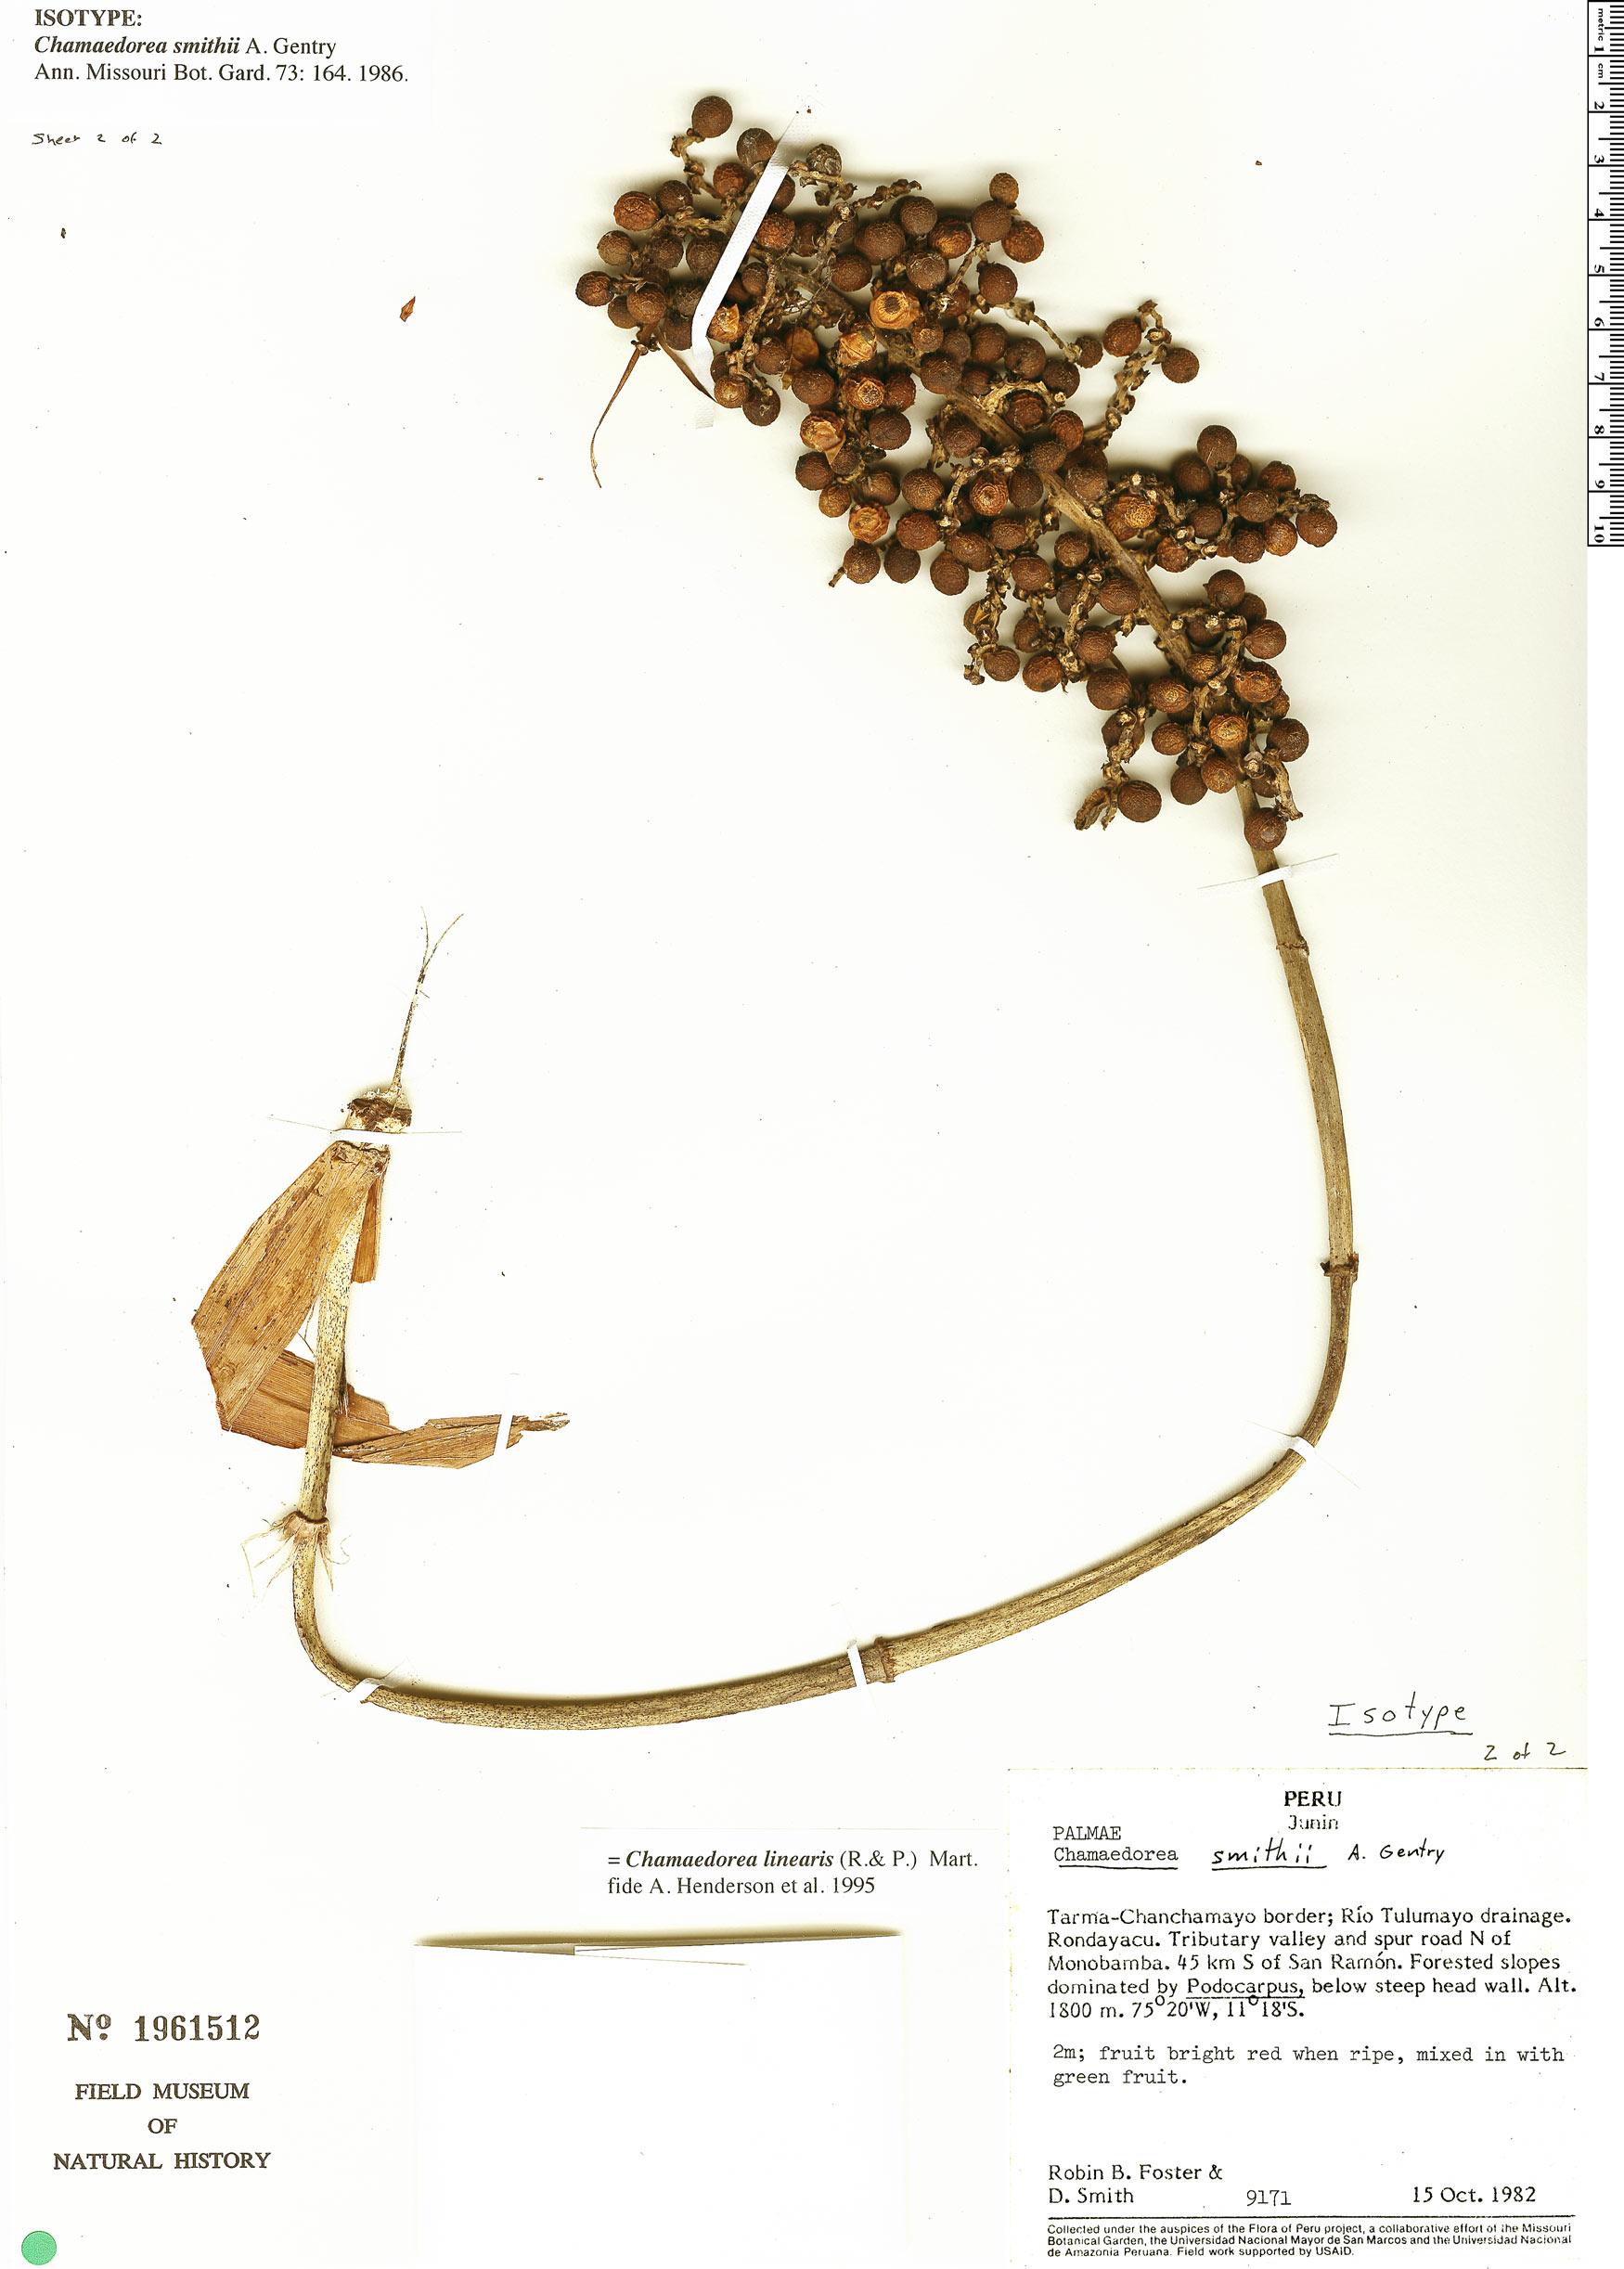 Specimen: Chamaedorea linearis